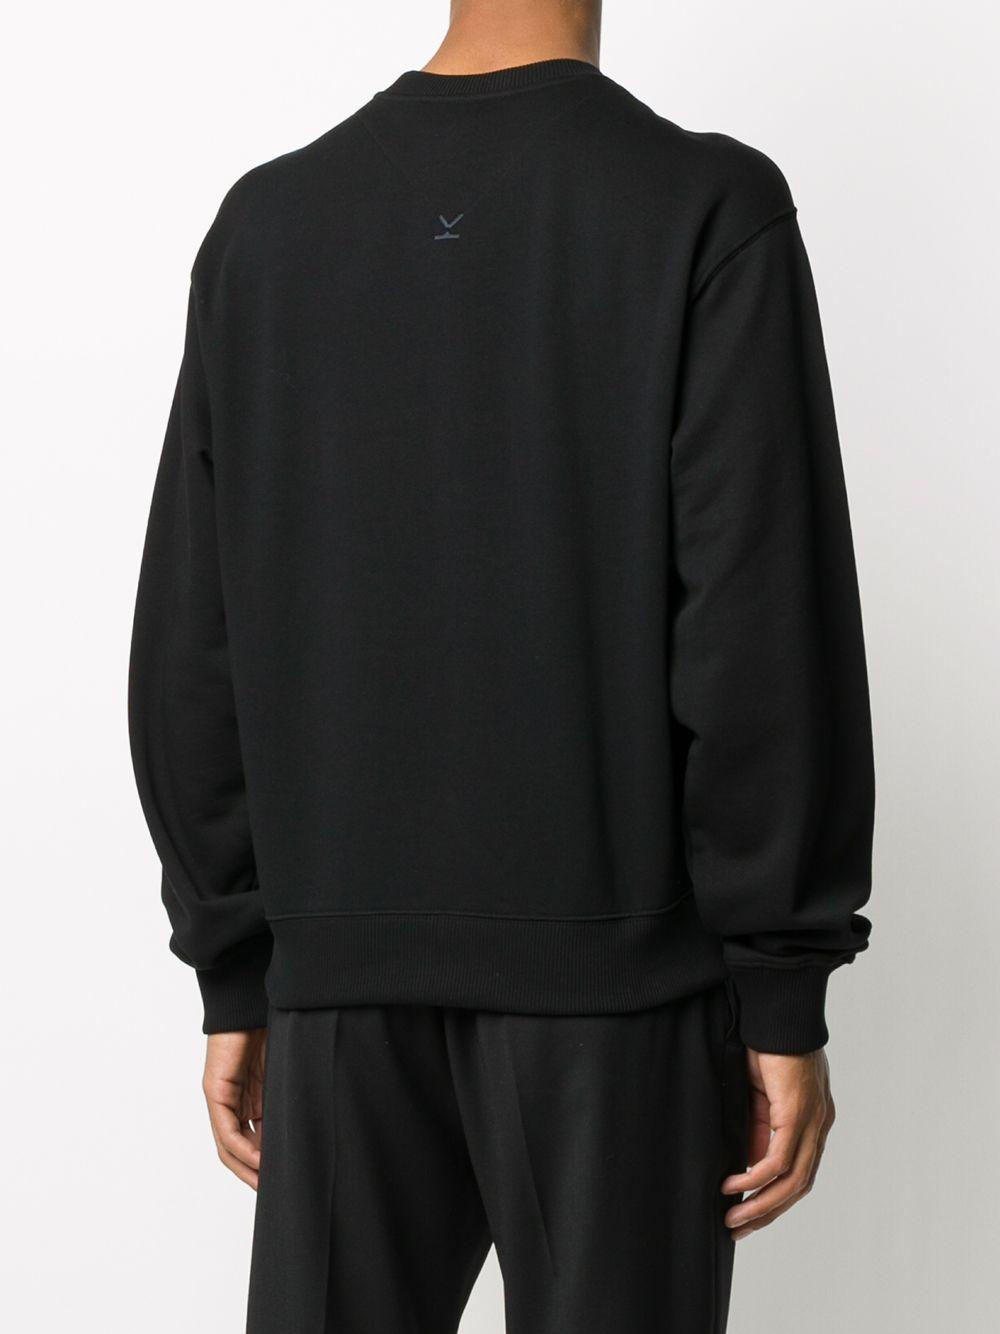 KENZO KENZO   Sweatshirts   FA65SW0004MD99